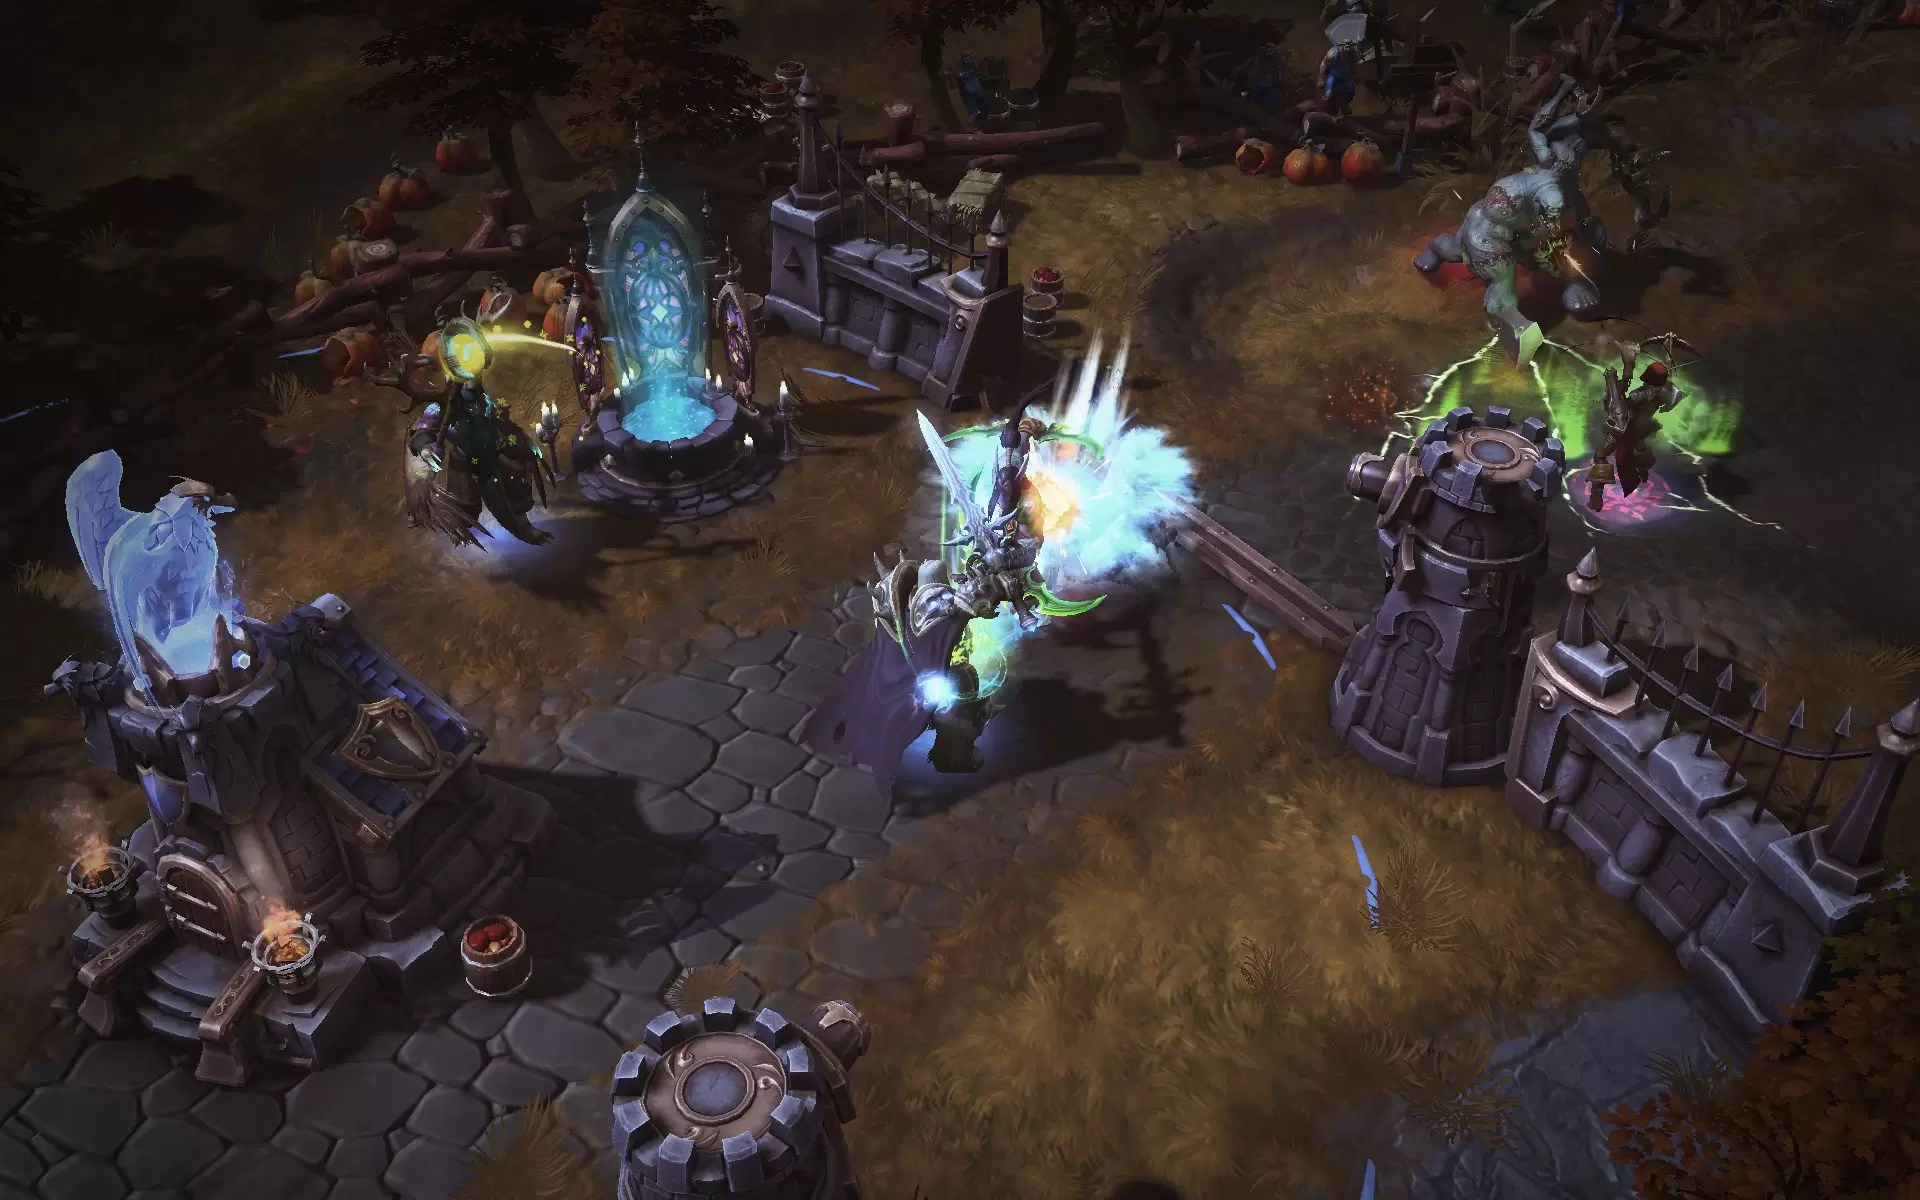 HotS: Stigao novi patch, Blizzard poslušao kritike oko XP promena